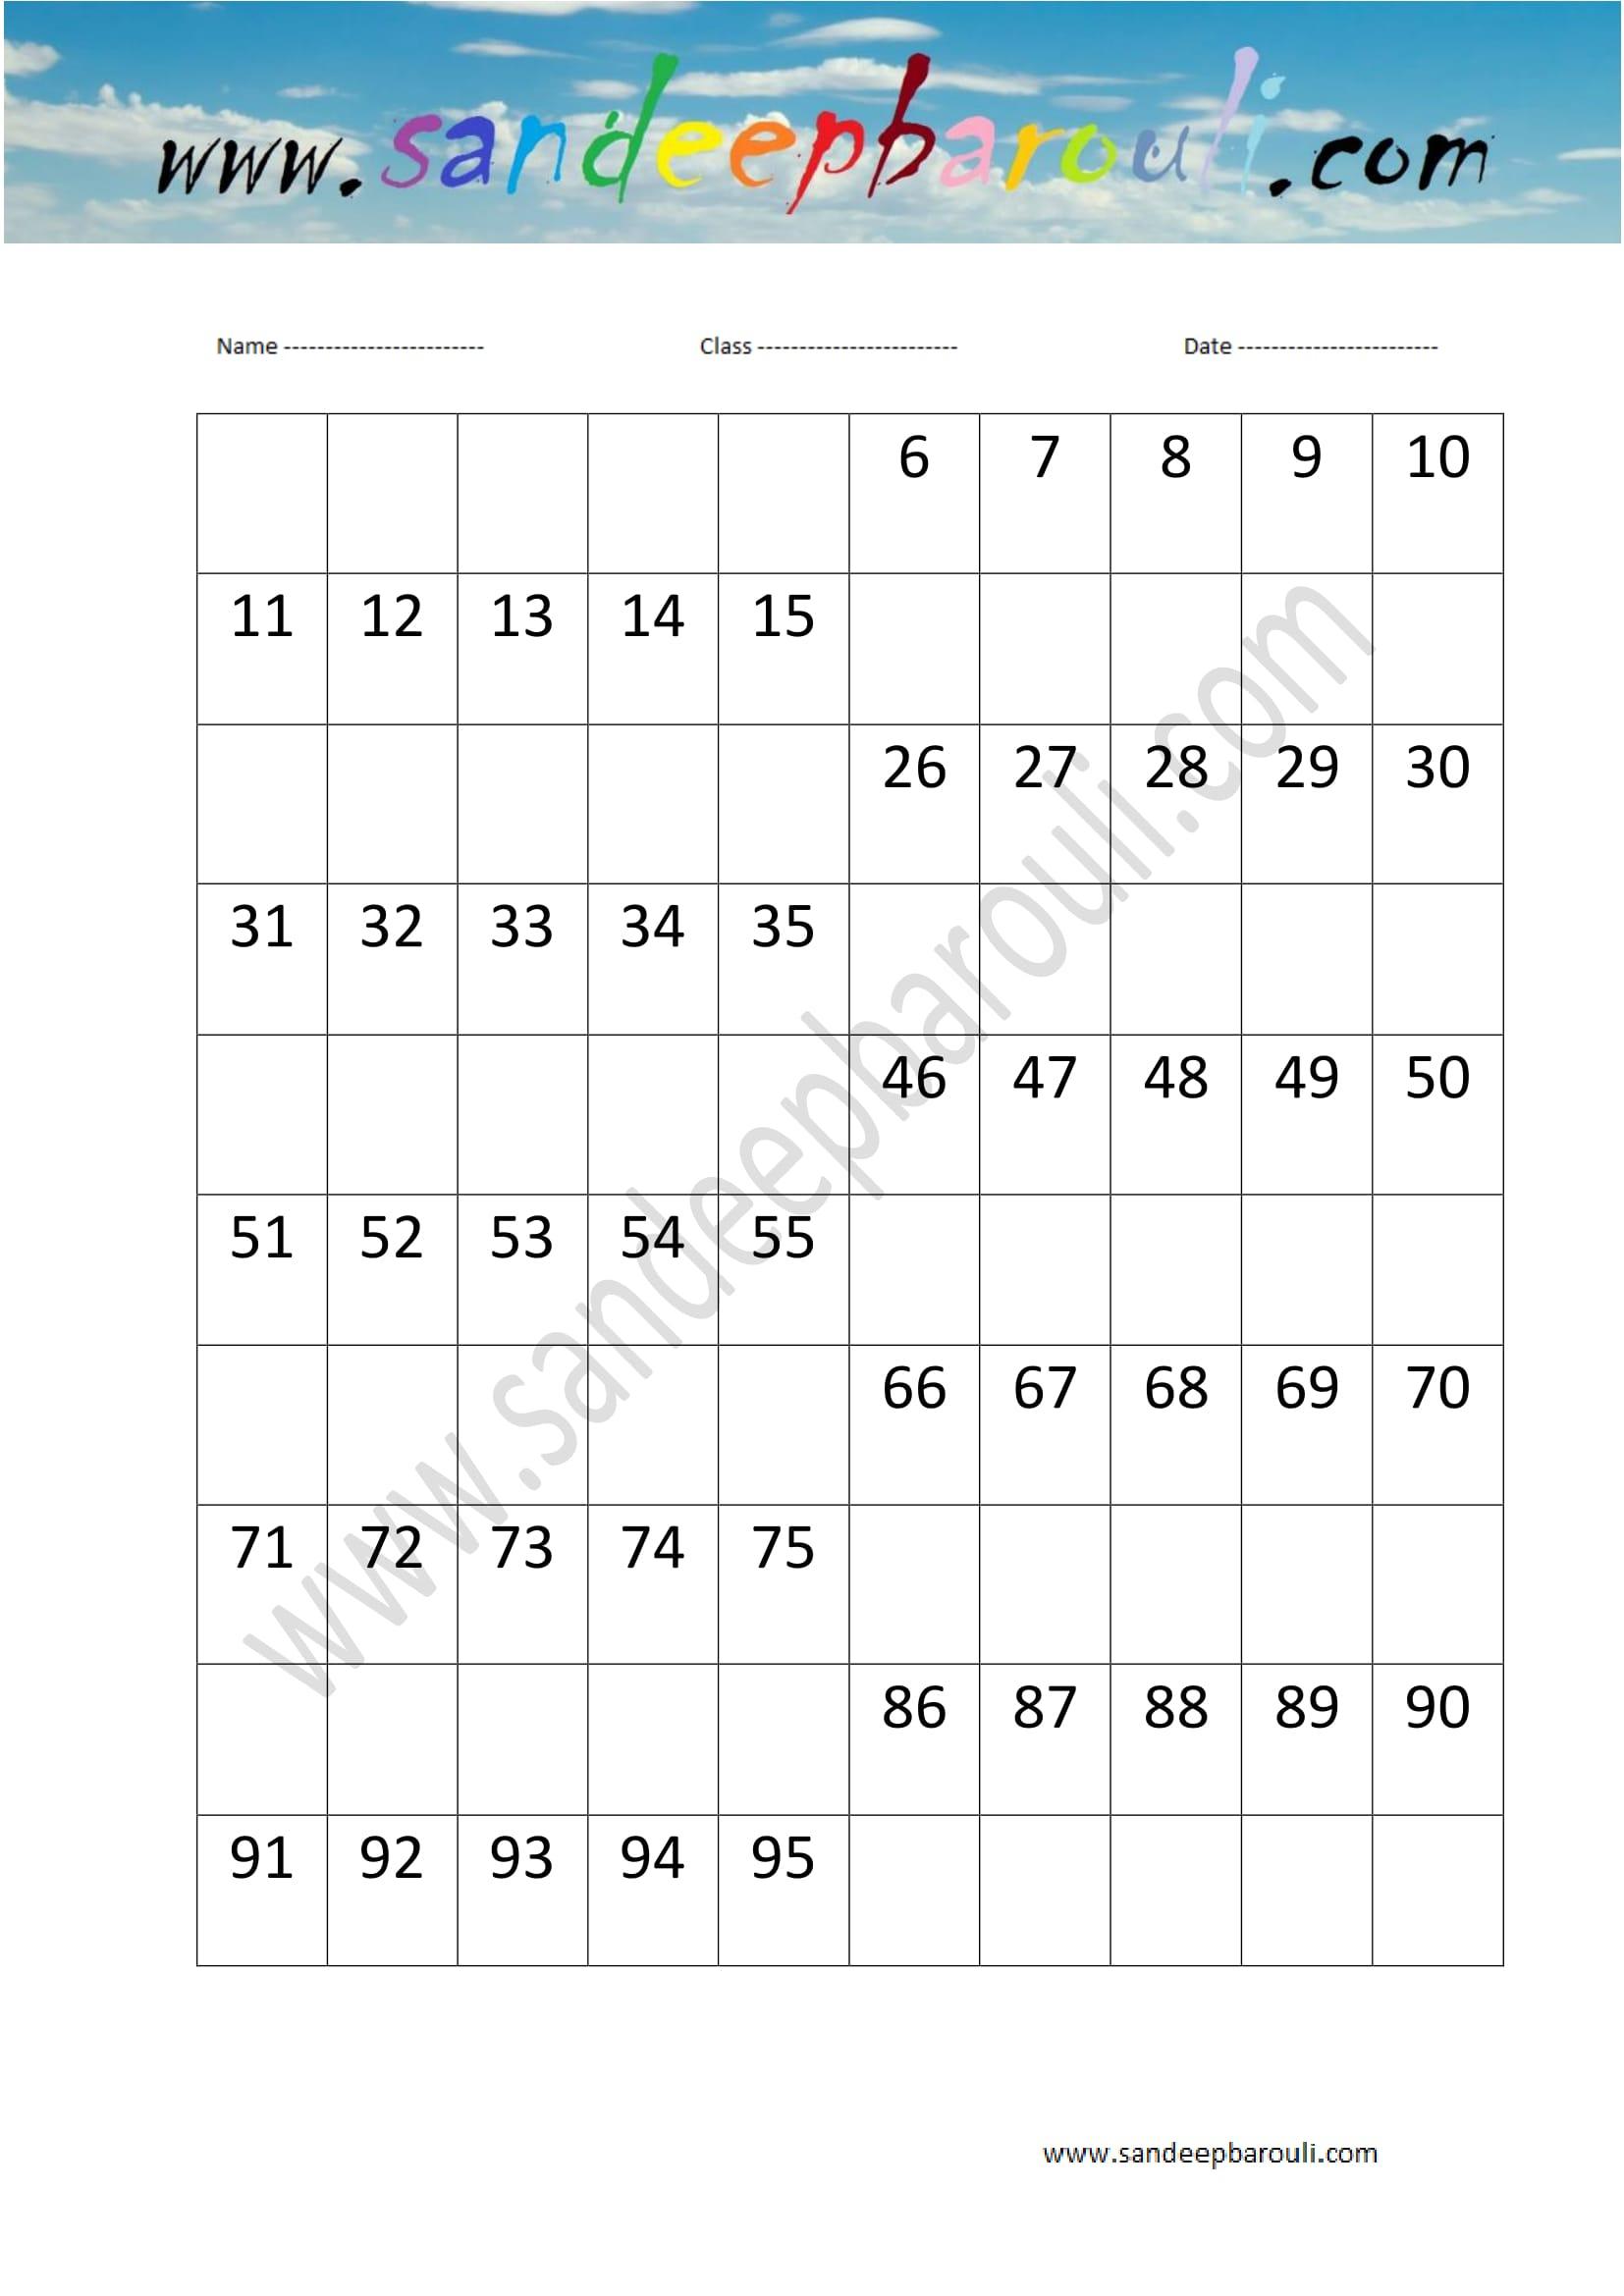 Math Worksheets For Kids 48 Sandeepbarouli